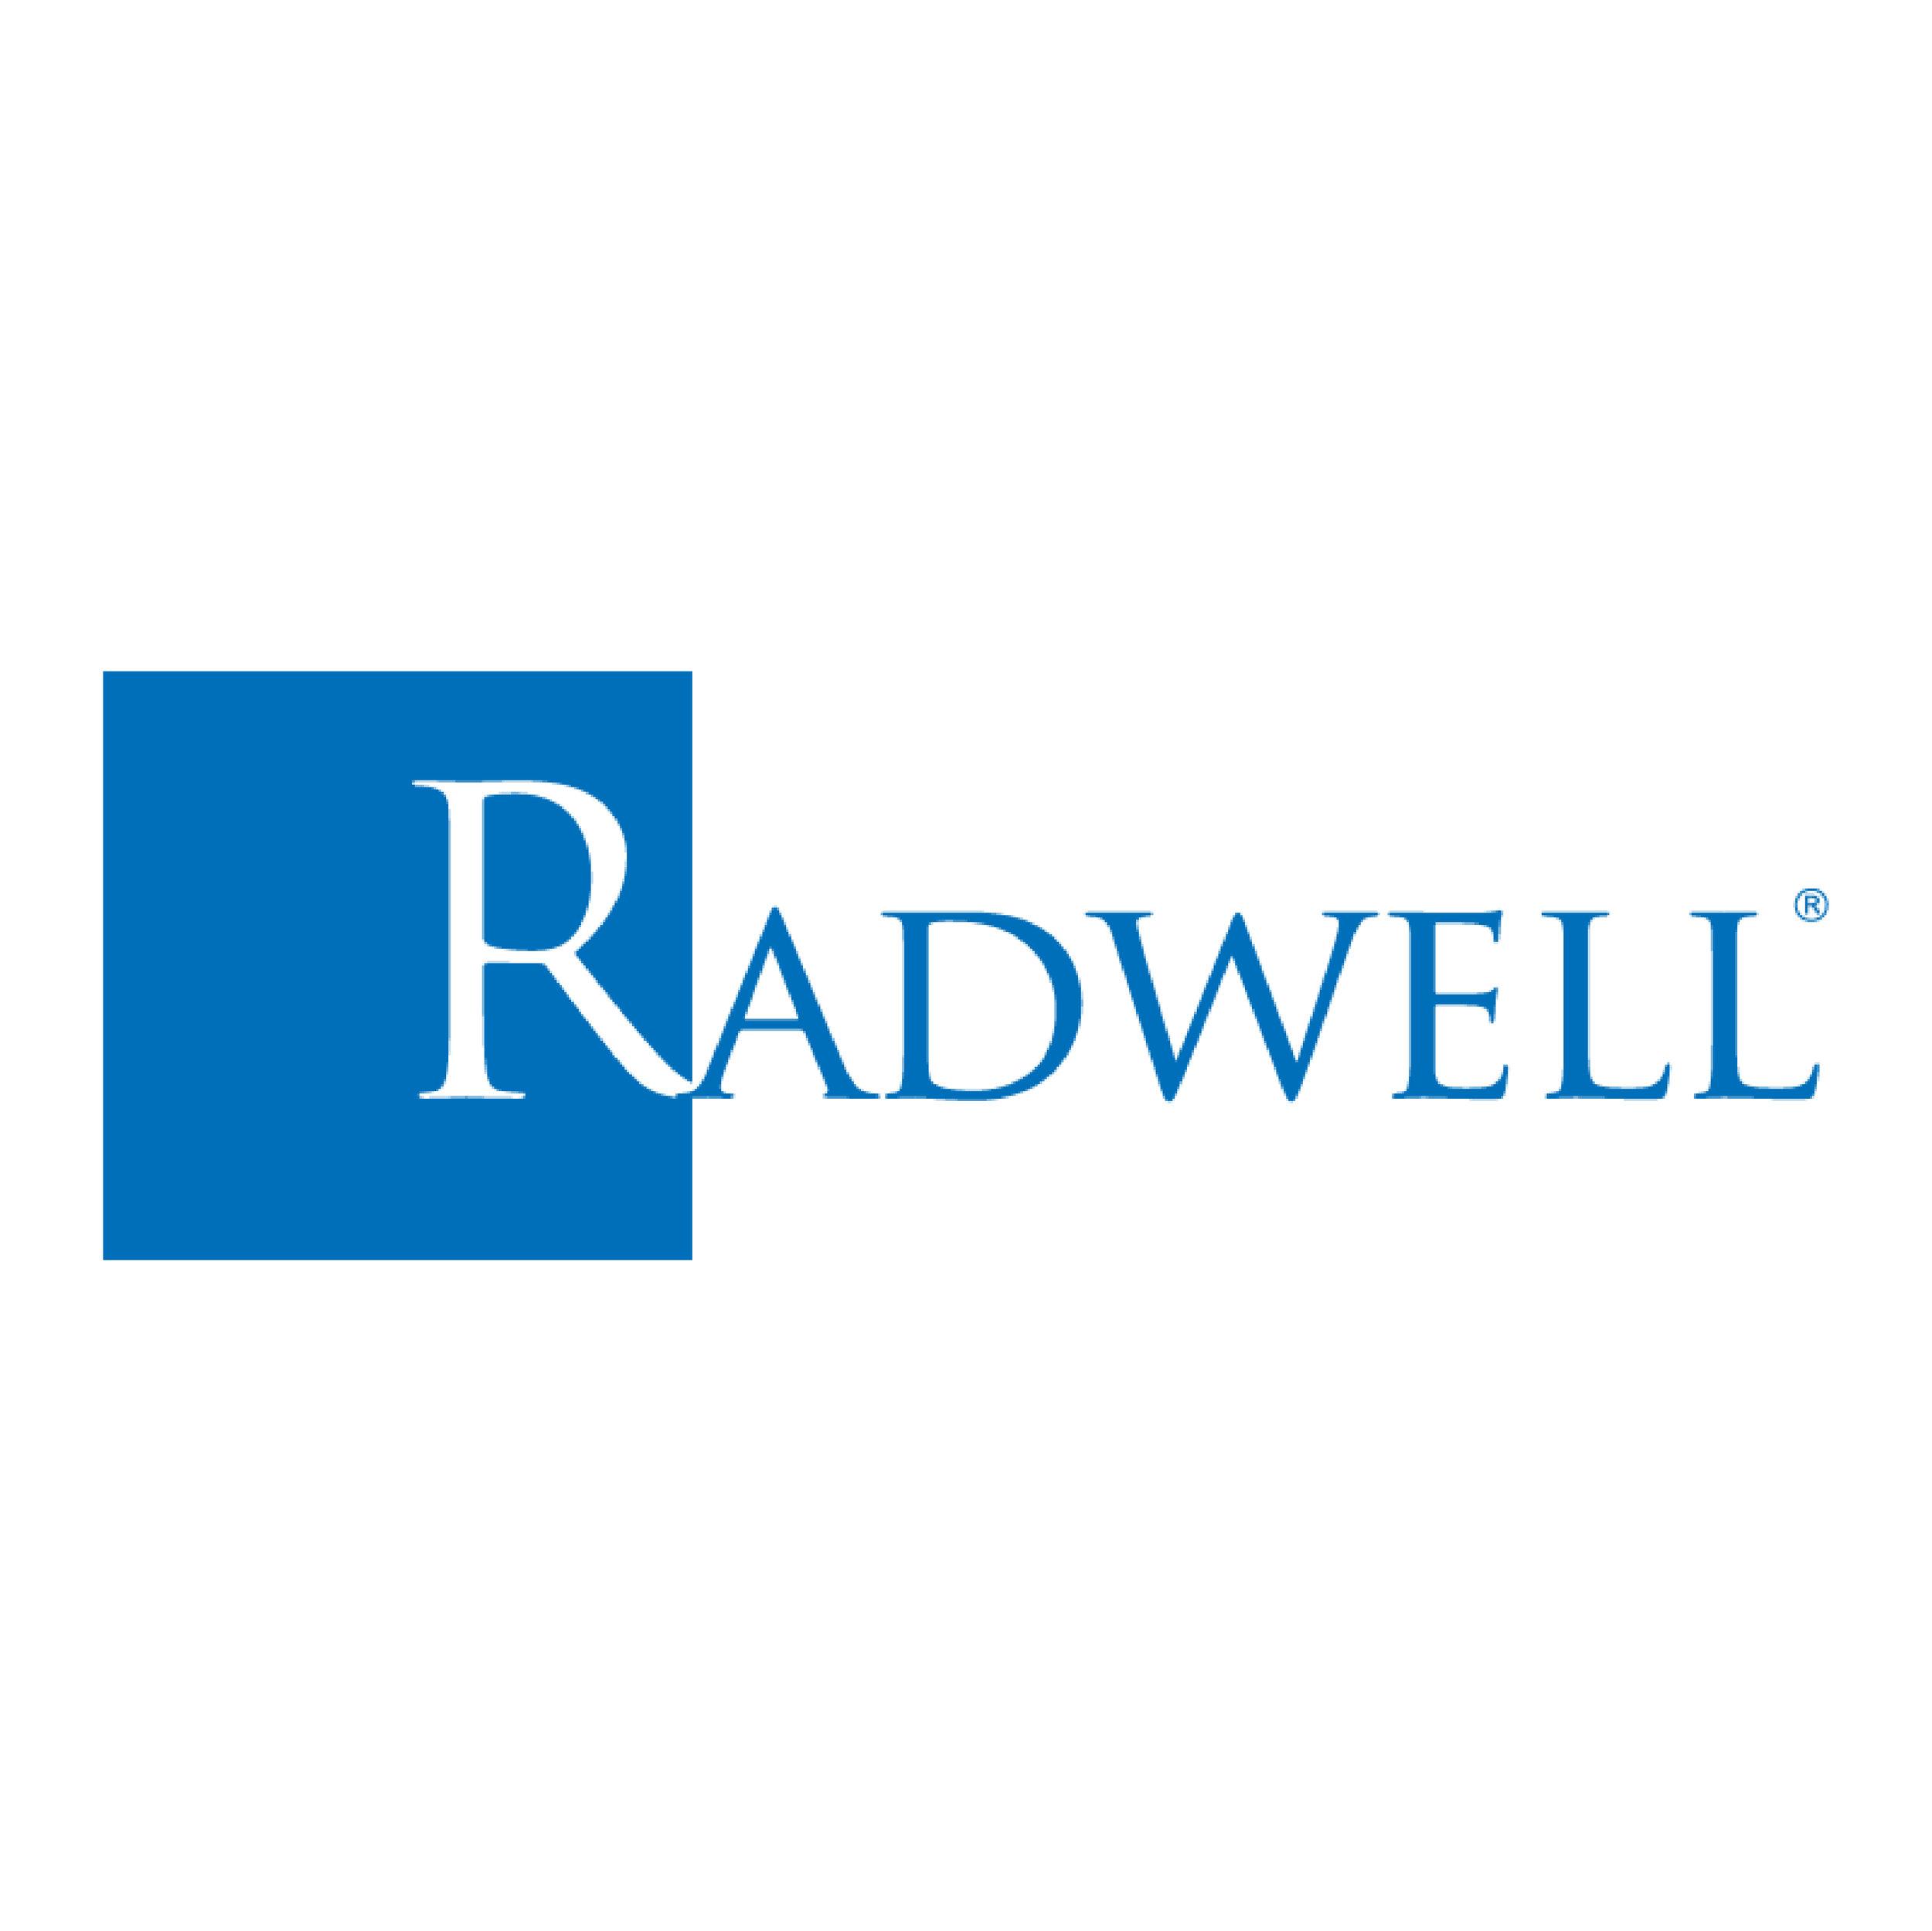 Radwell.jpg